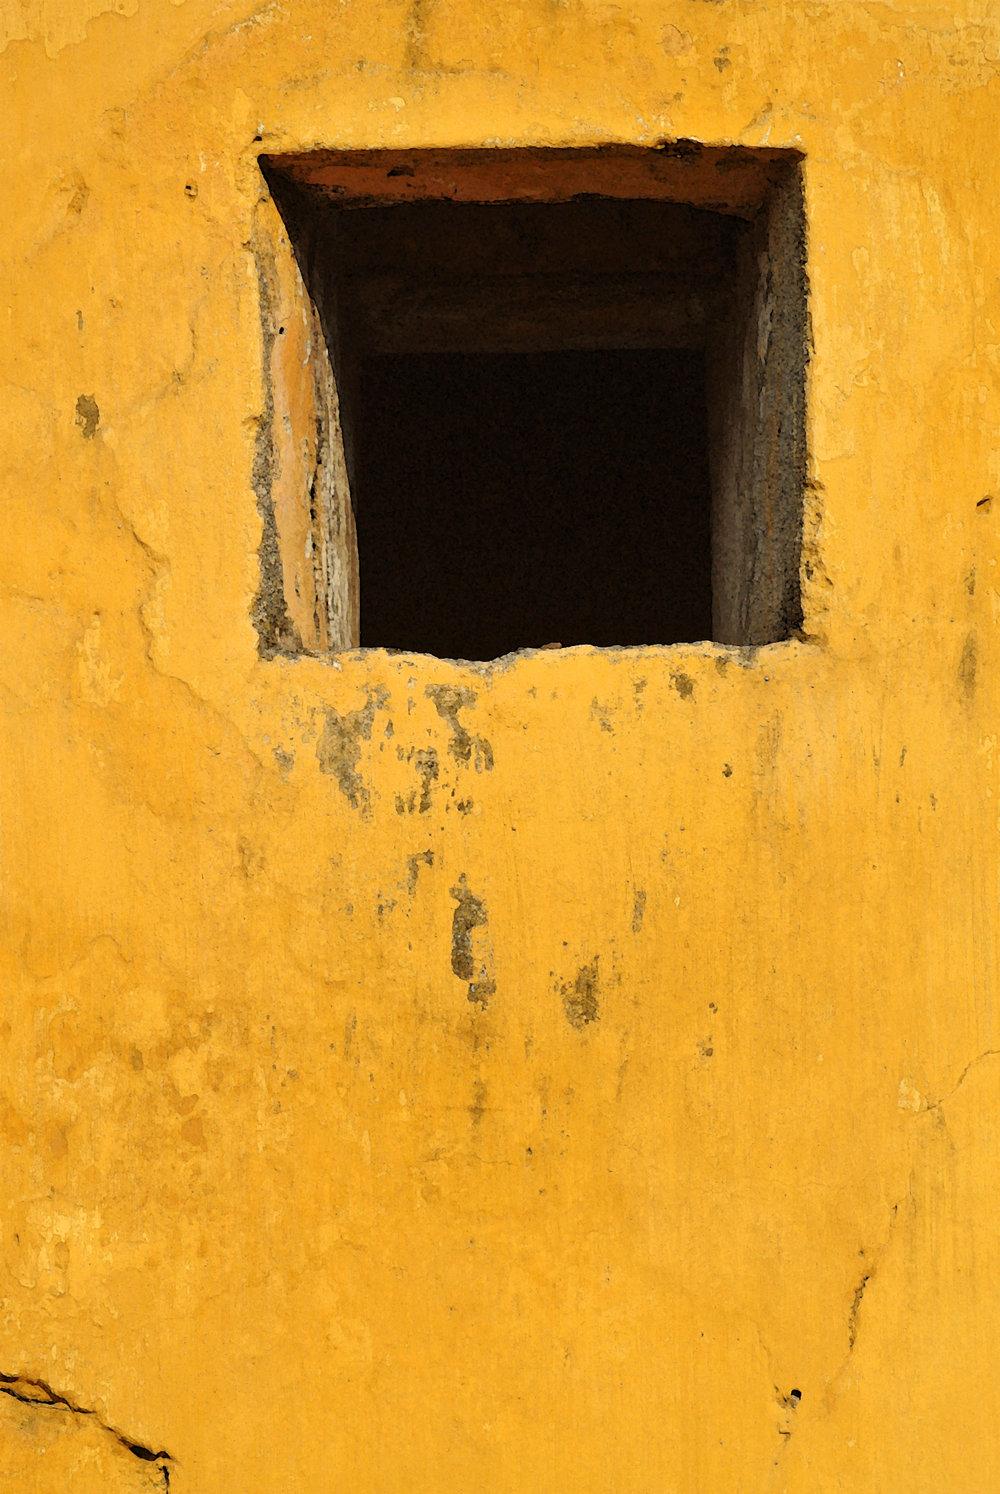 hoi-an-orange-wall-with-hole.jpg